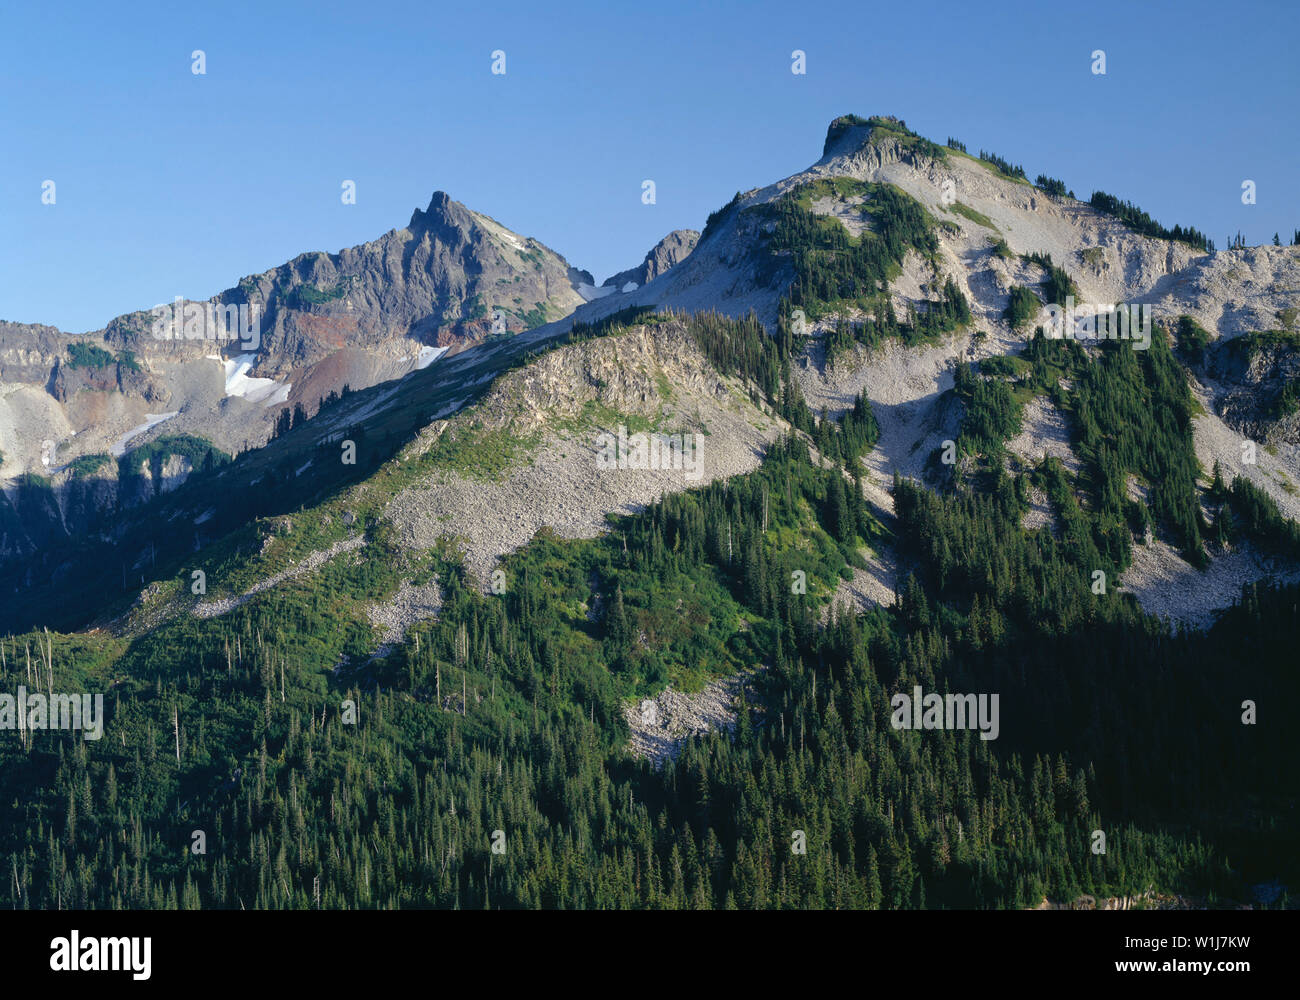 USA, Washington, Mt. Rainier National Park, Unicorn Peak and the Tatoosh Range rise above evergreen forest. - Stock Image